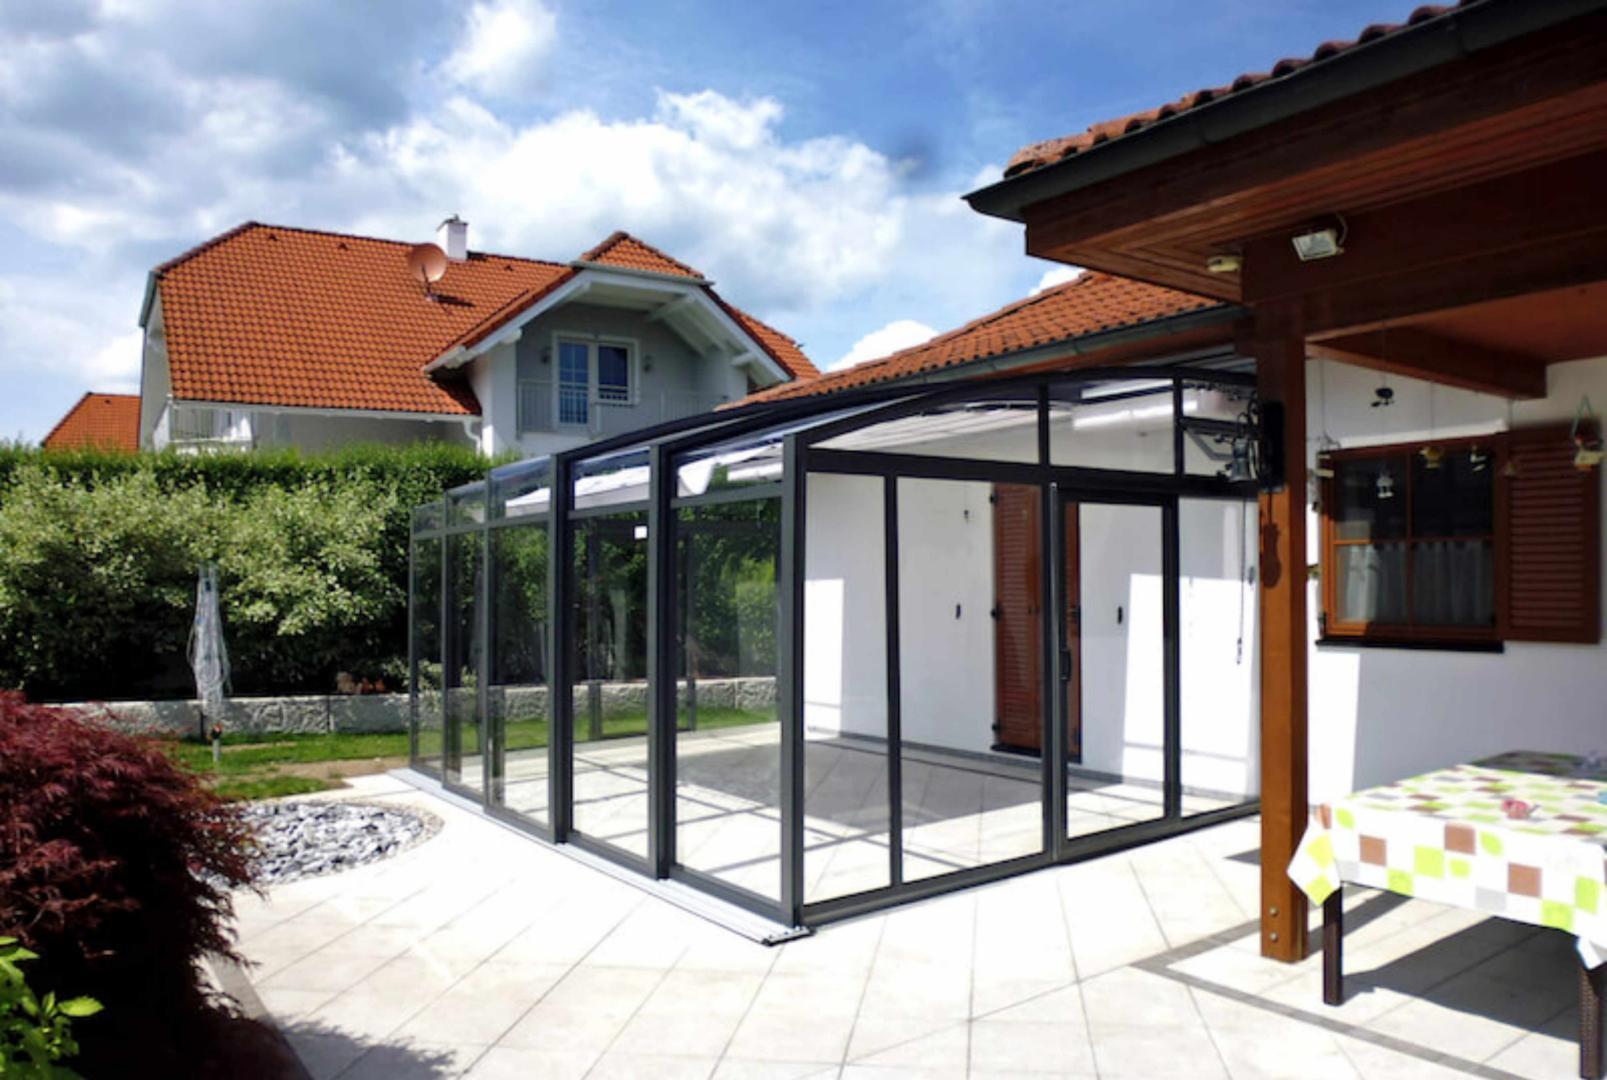 abri de terrasse topaz pans droits la solar v randa topas coulissante de v roka juralu. Black Bedroom Furniture Sets. Home Design Ideas